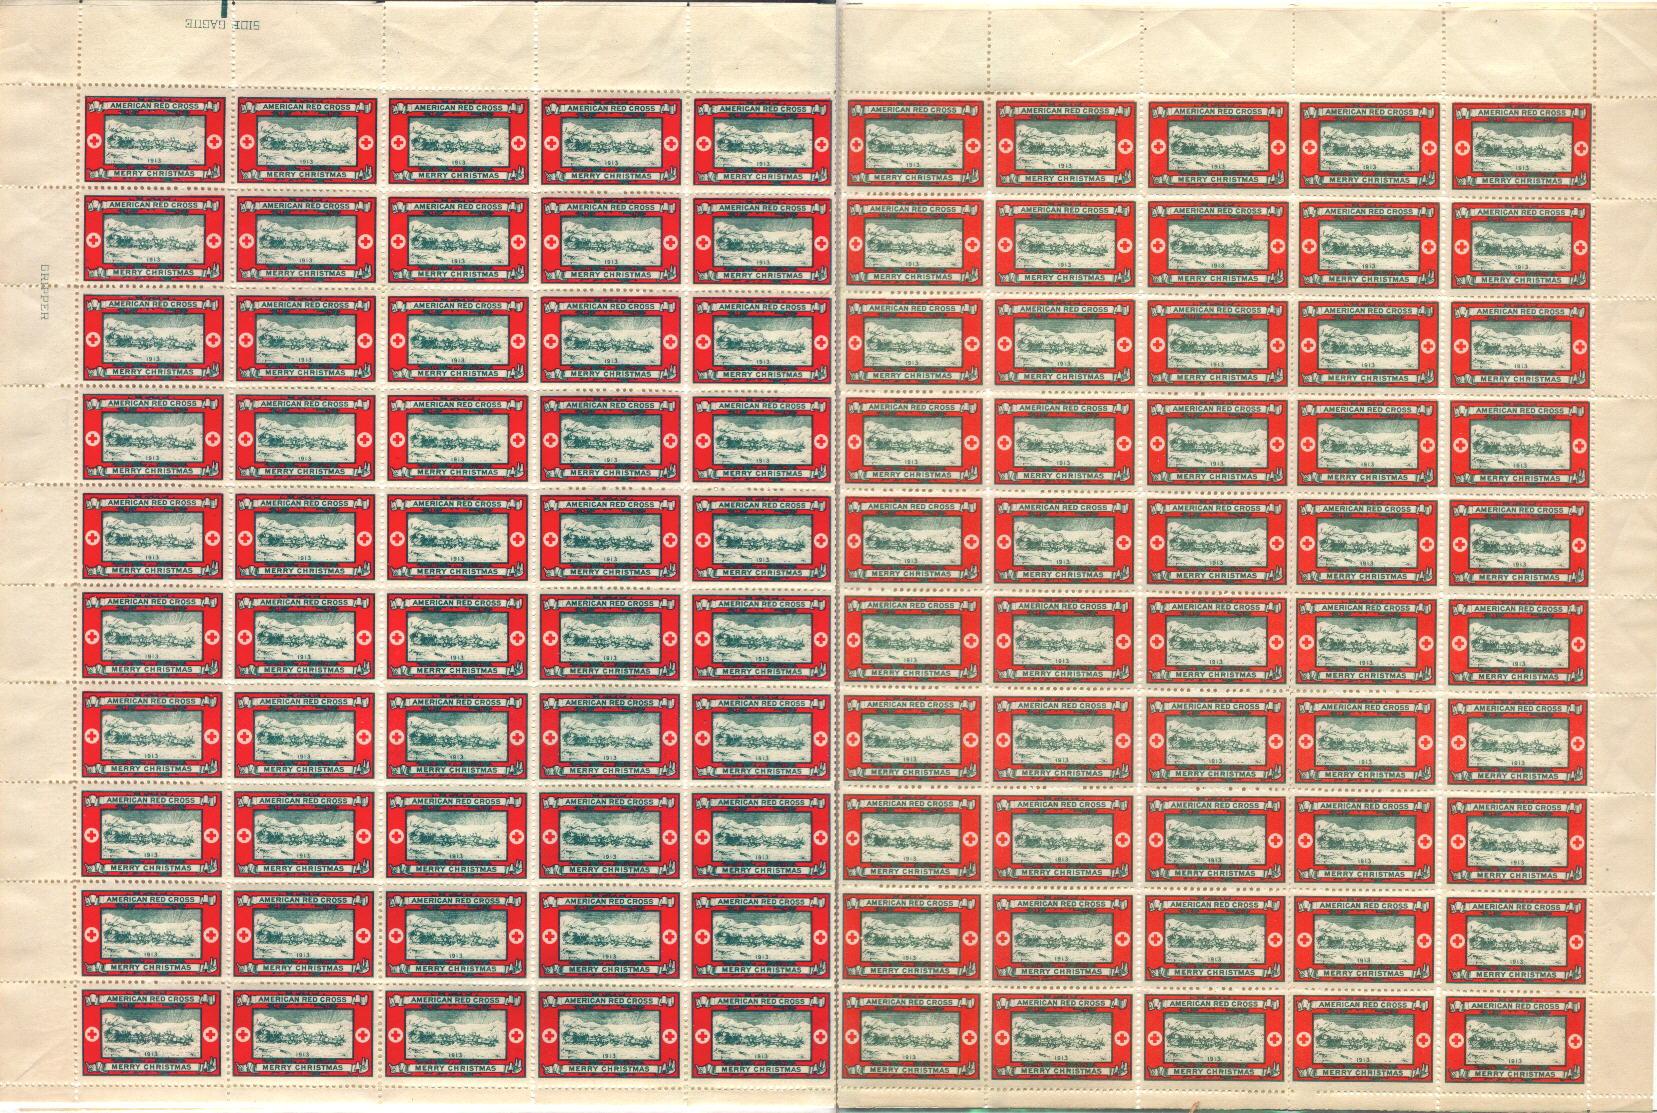 1913 Type 3 Christmas Seal Sheet, No Gum